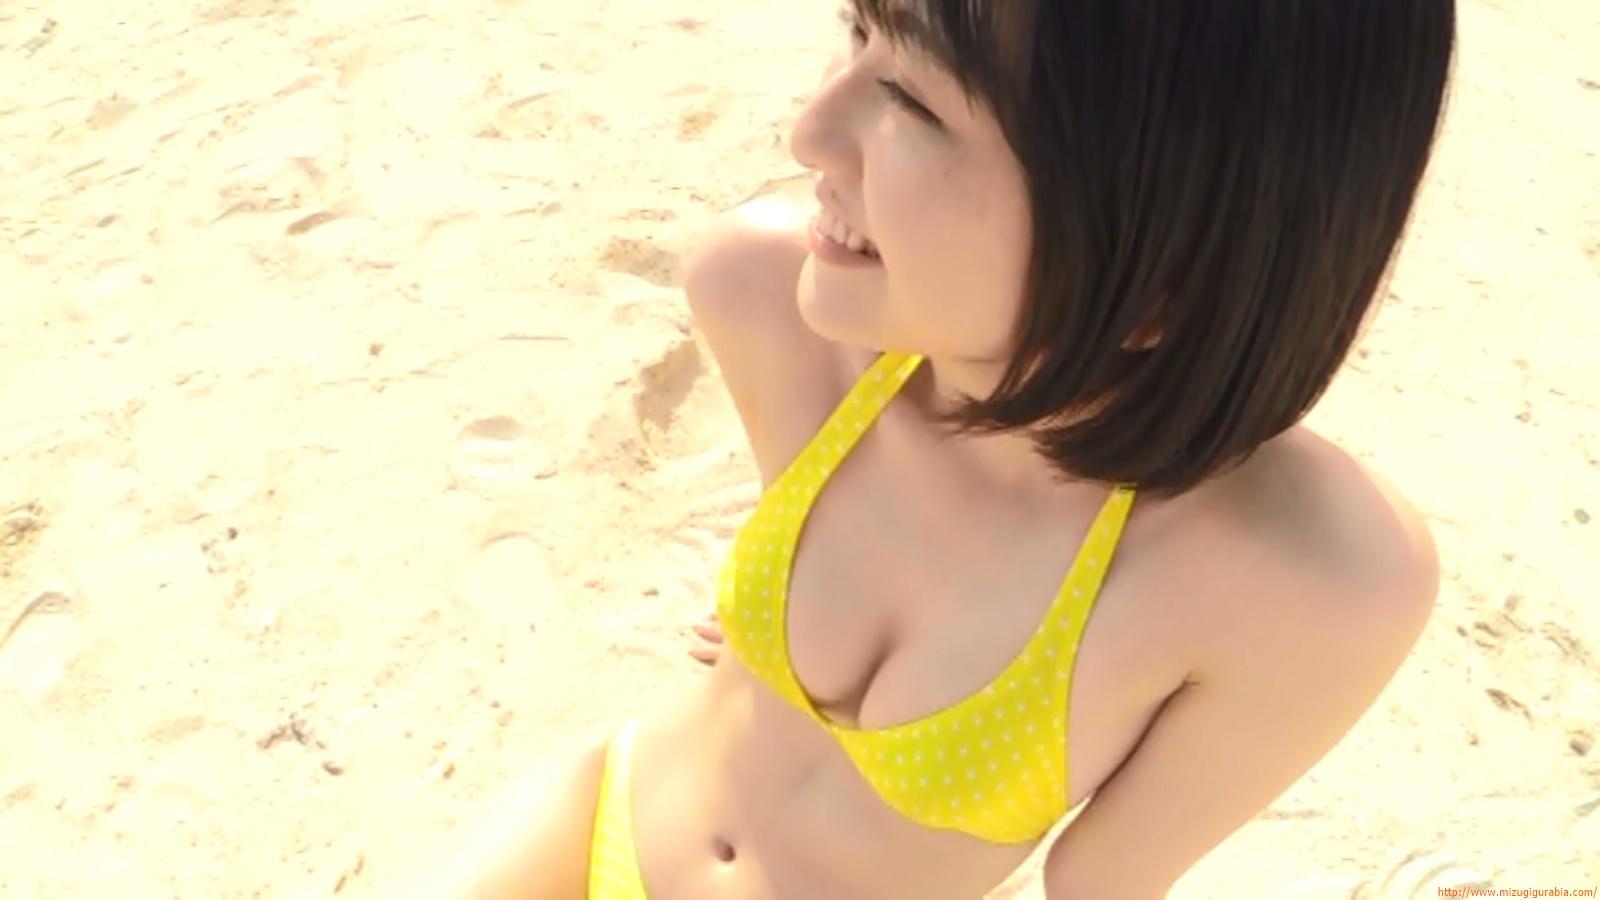 Beach dating222